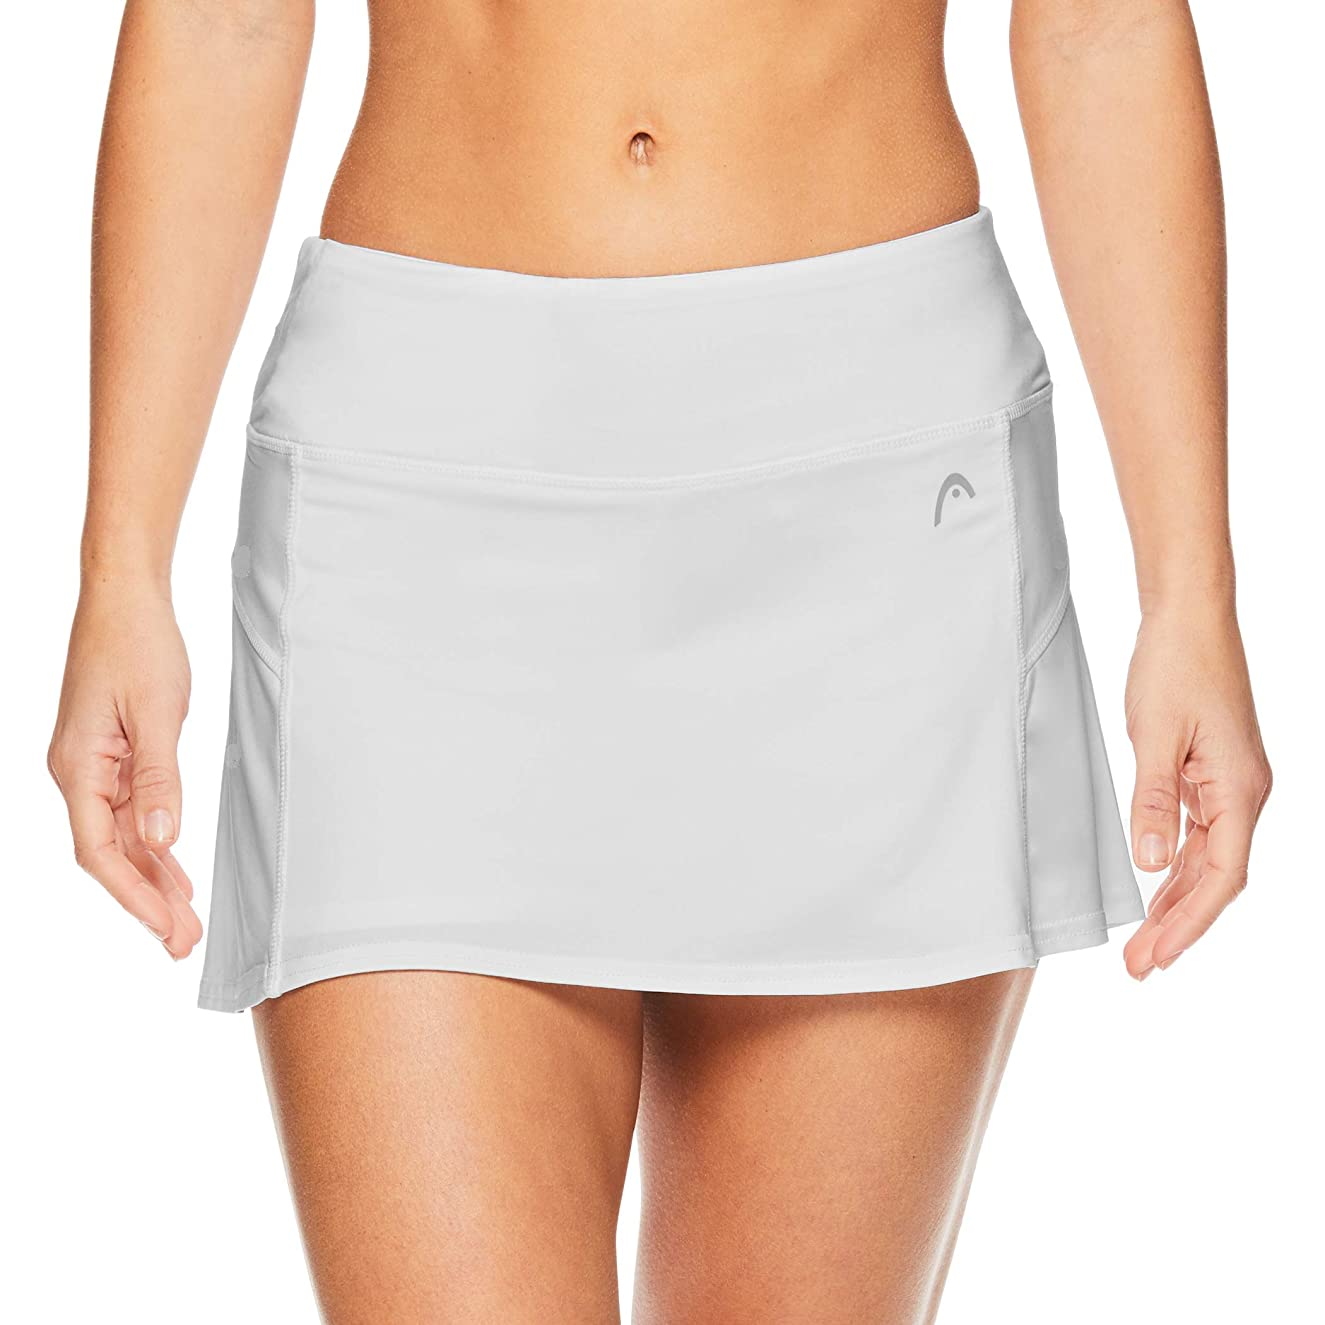 HEAD Women's Athletic Tennis Skort - Performance Training & Running Skirt